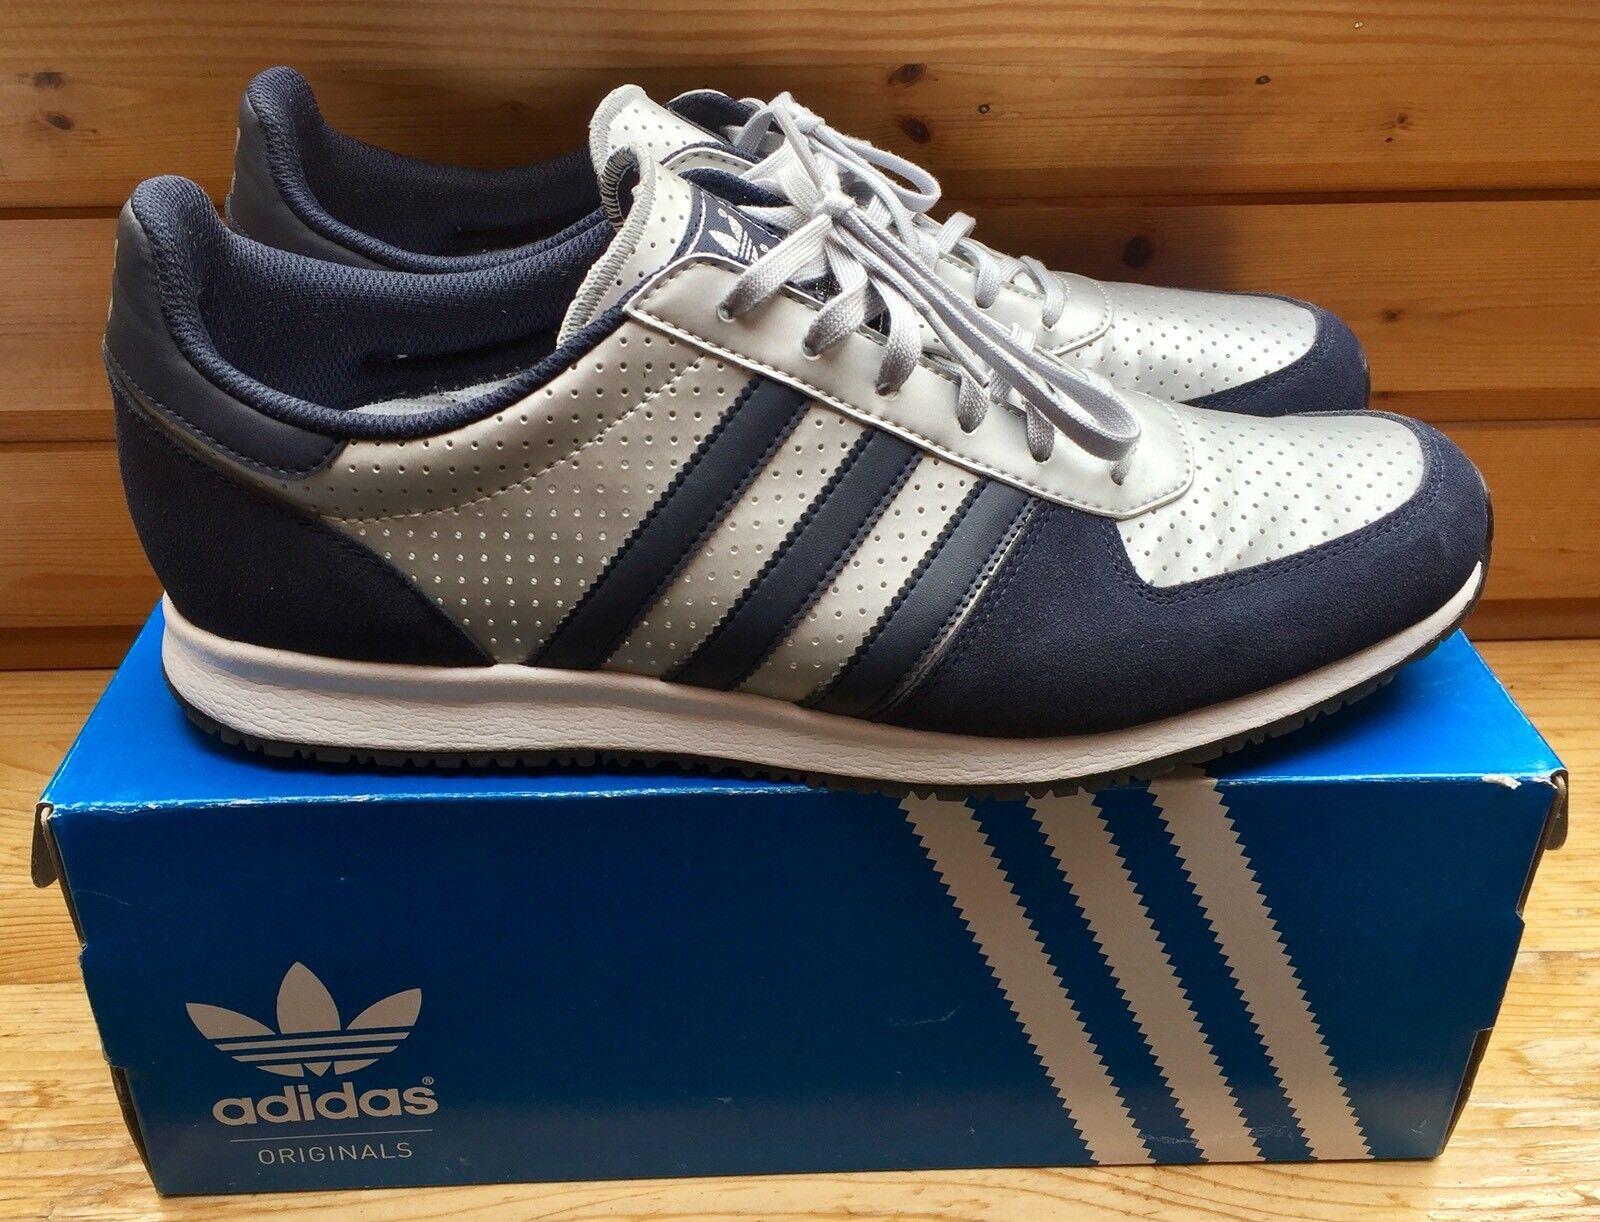 Adidas Adistar Racer Gr. 47 1 3 blau silber OVP seltene Farbkombination UK 12